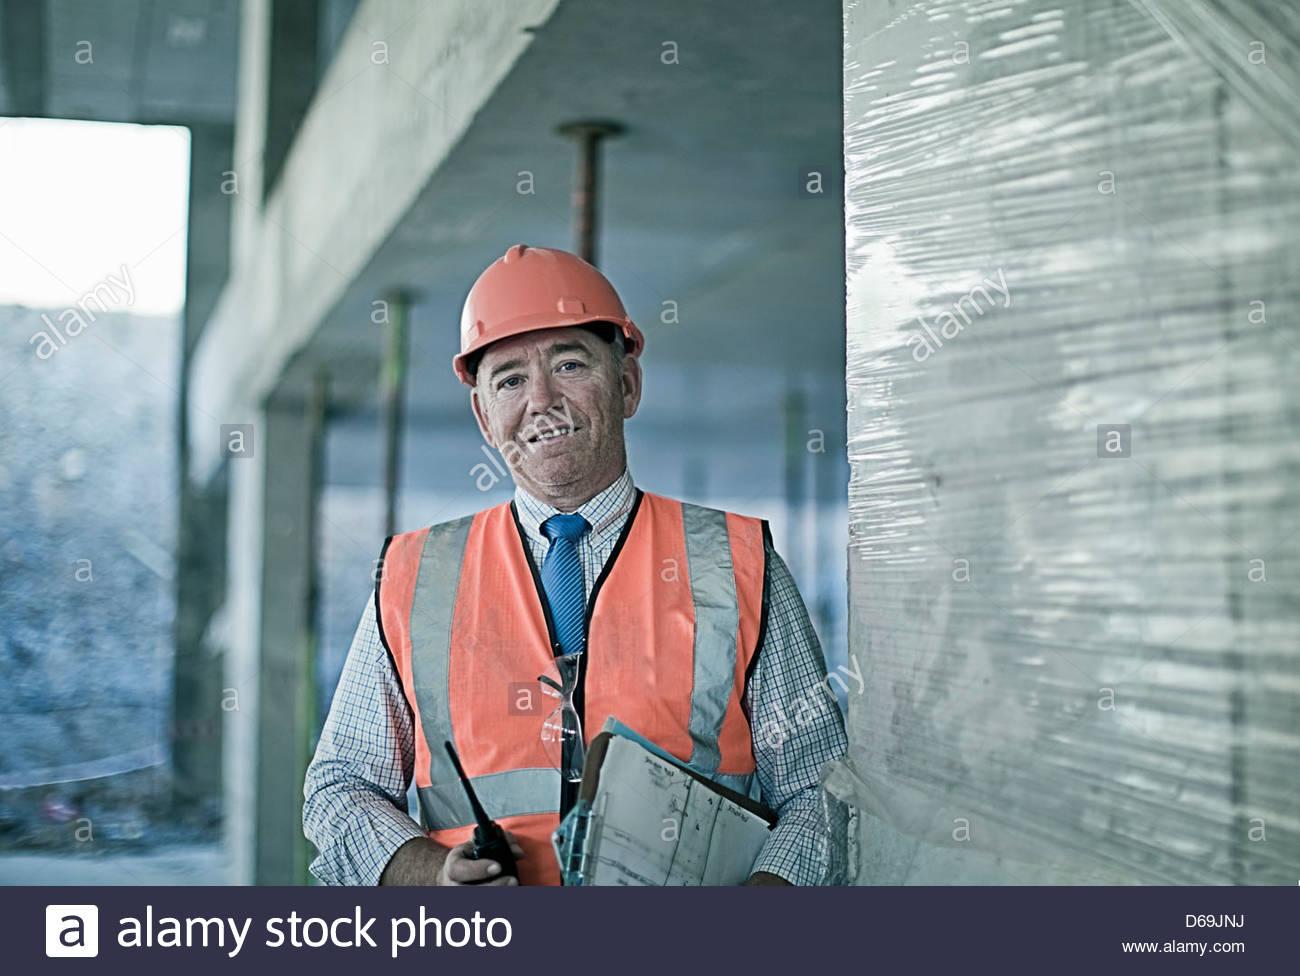 Businessman on construction site - Stock Image